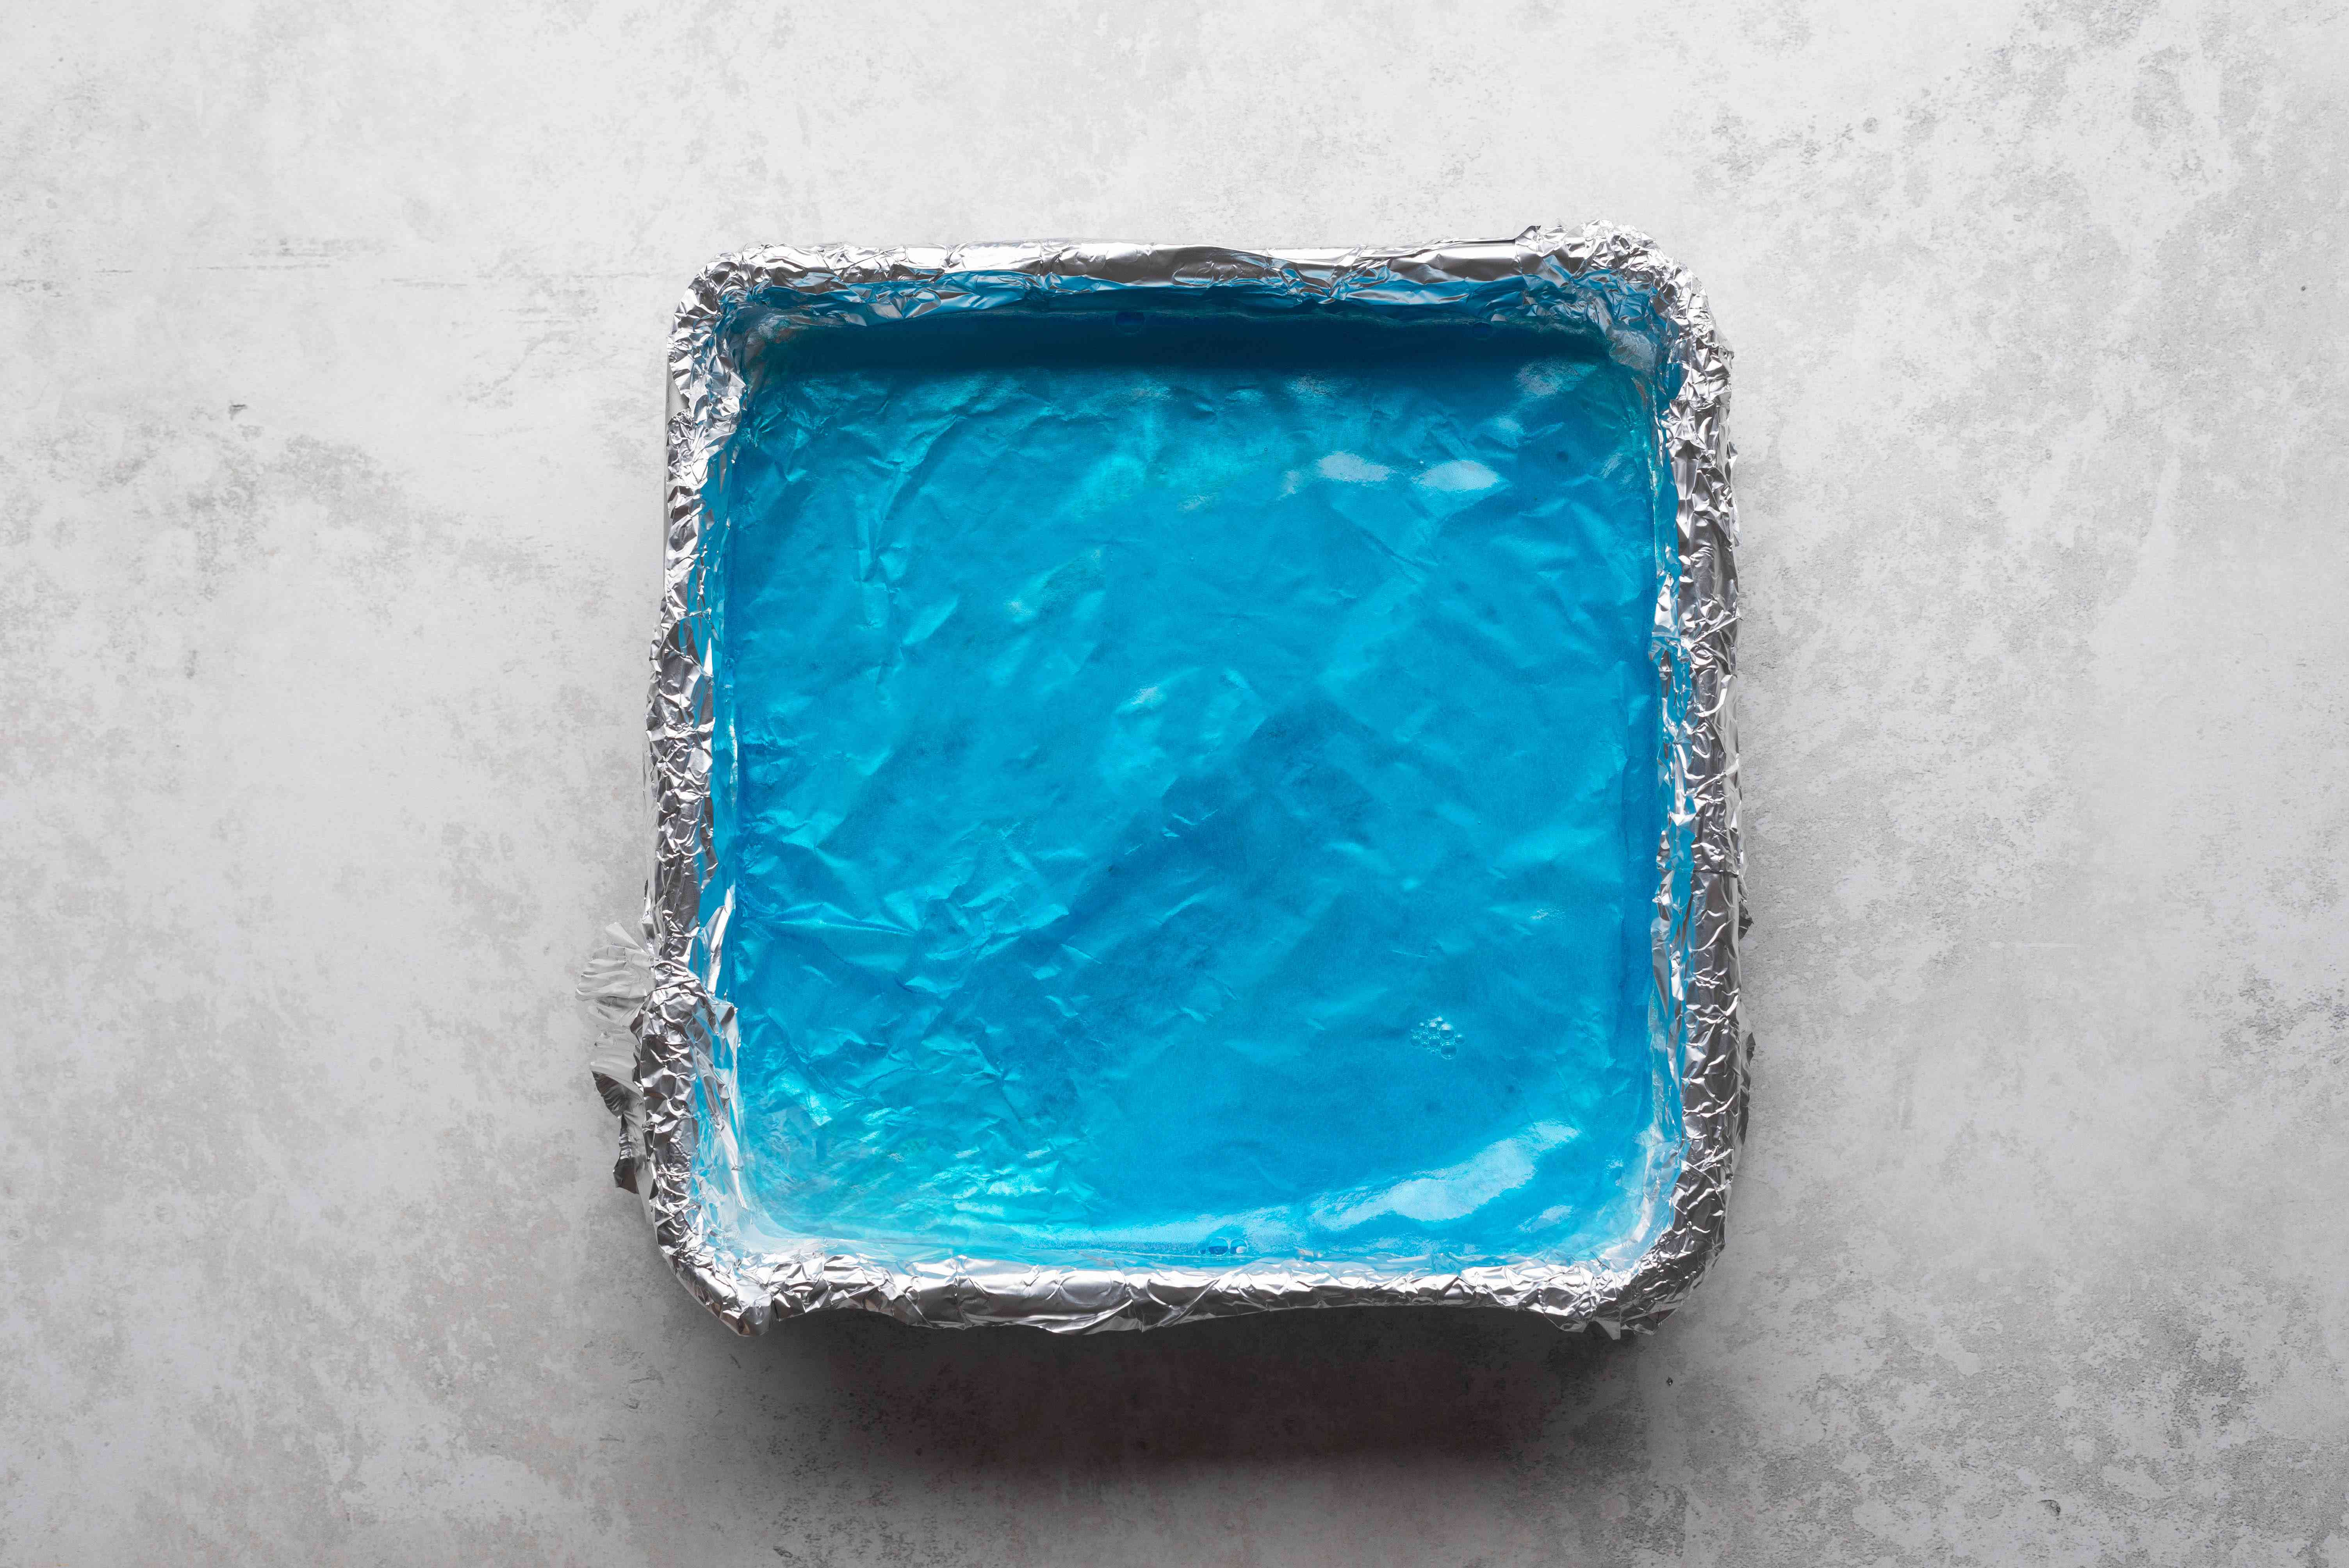 glue gelatin in a baking dish